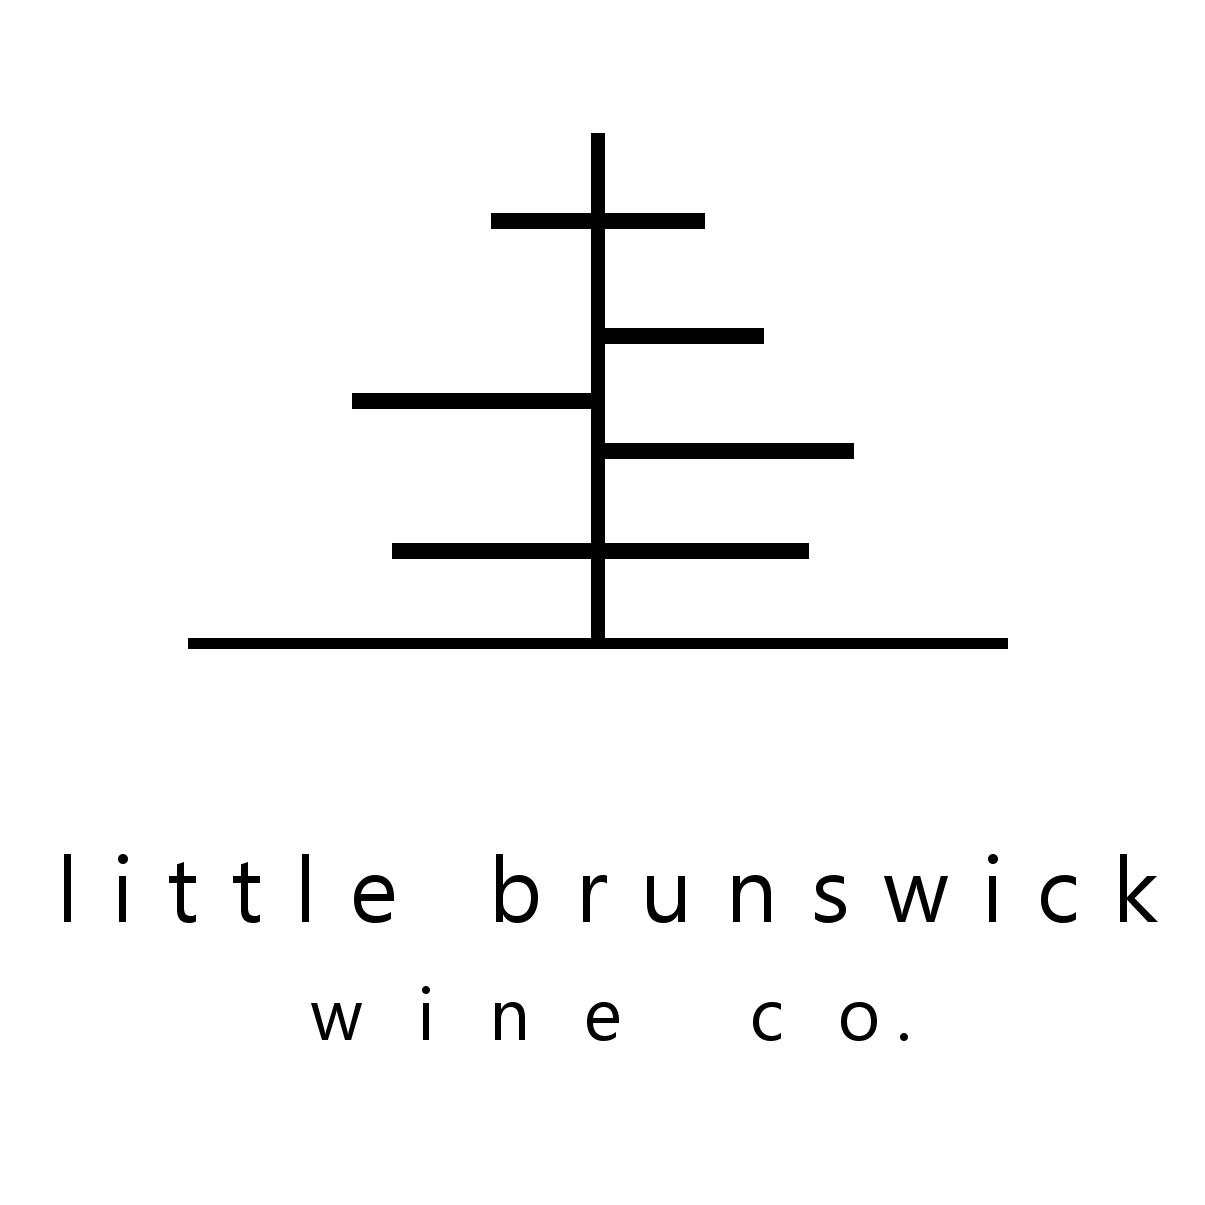 Little Brunswick Wine Co